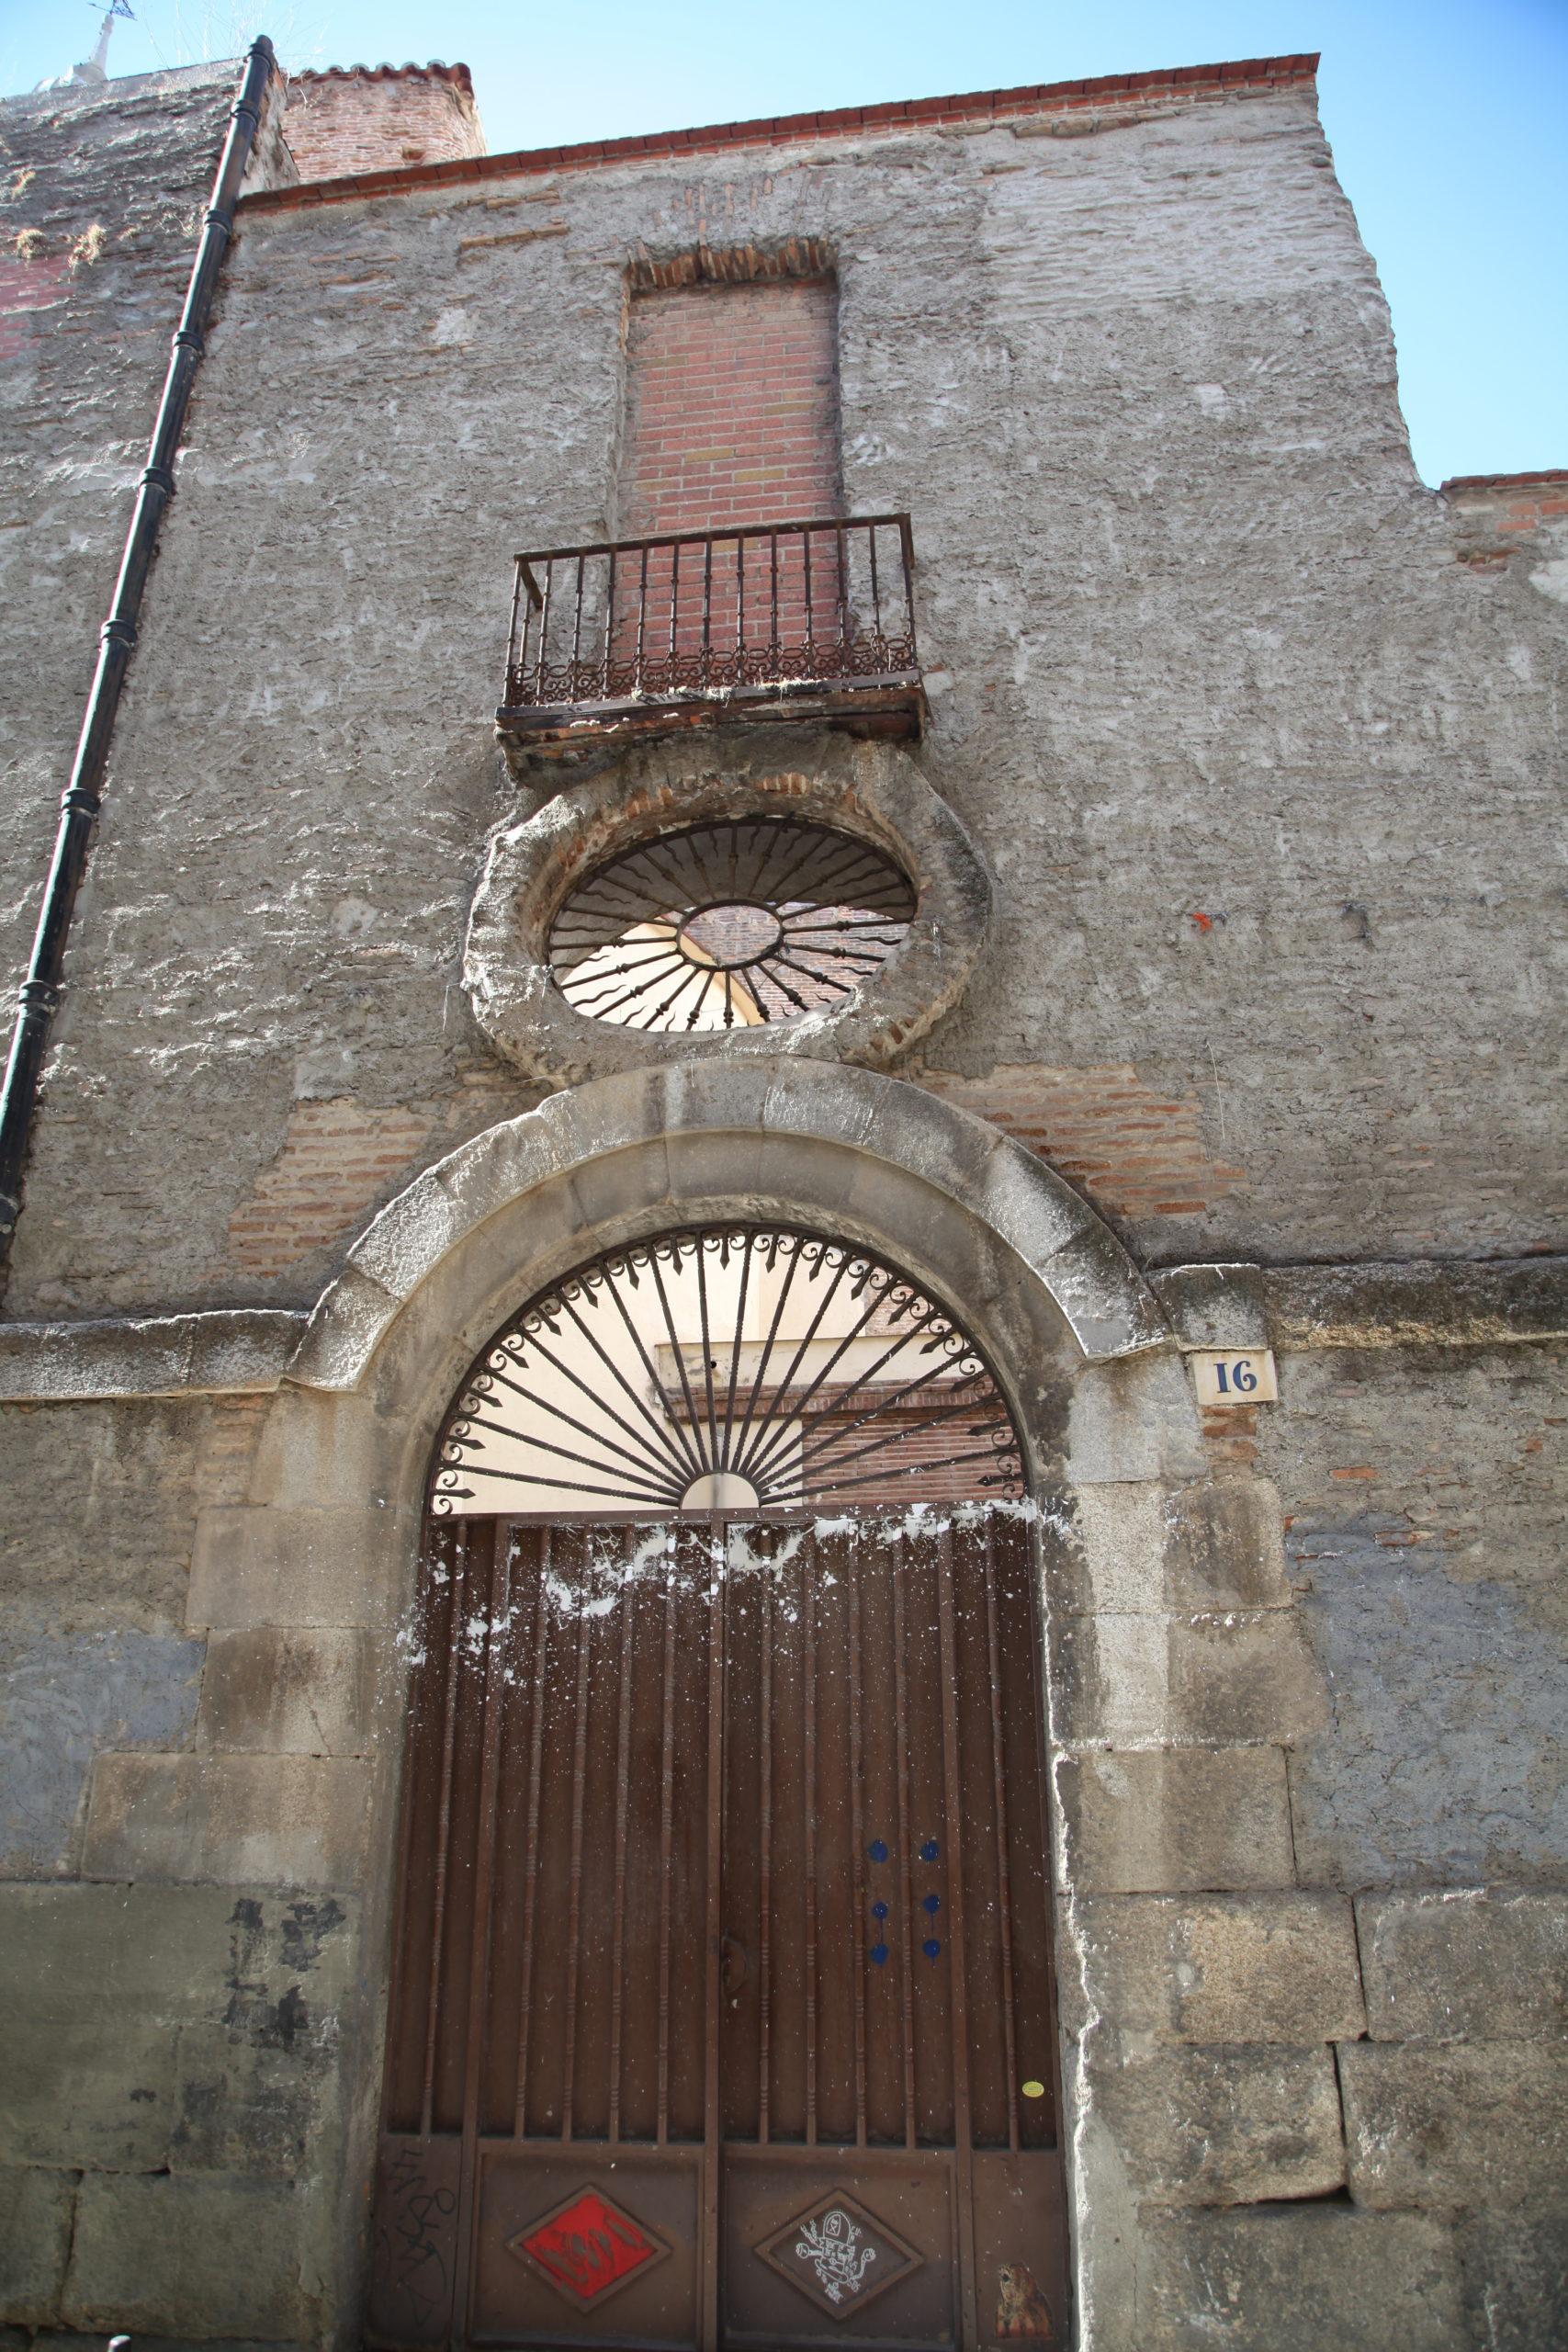 convento-puerta-IMG_2966